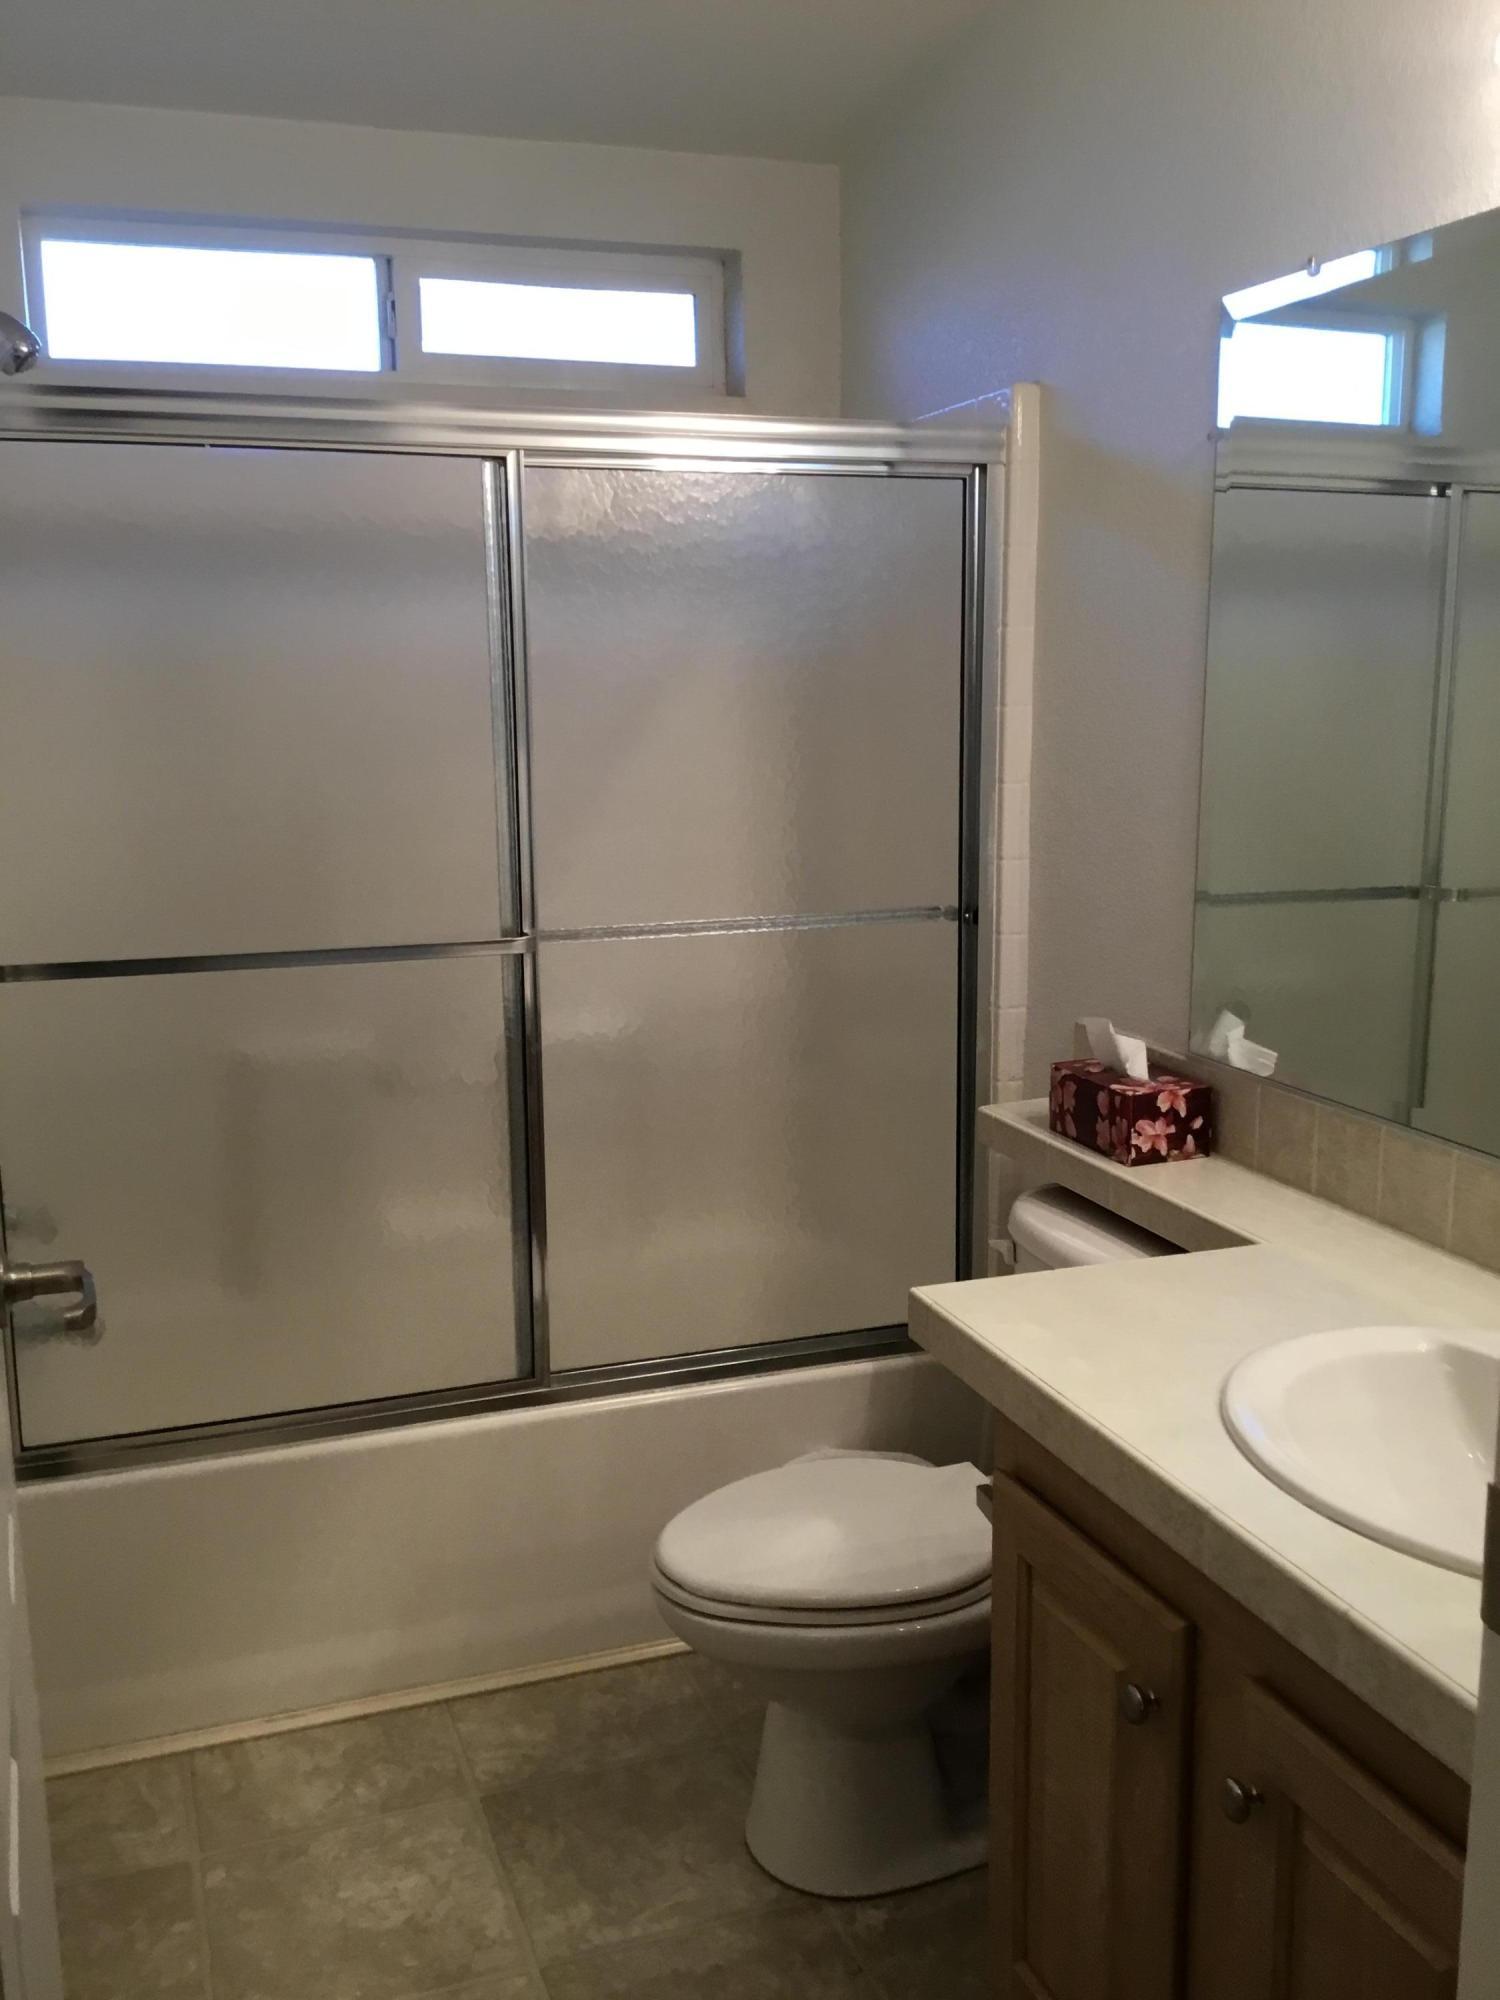 1329 Via Palmera, Cathedral City, California 92234, 3 Bedrooms Bedrooms, ,2 BathroomsBathrooms,Mobile/manufactured,For Sale,1329 Via Palmera,219033210